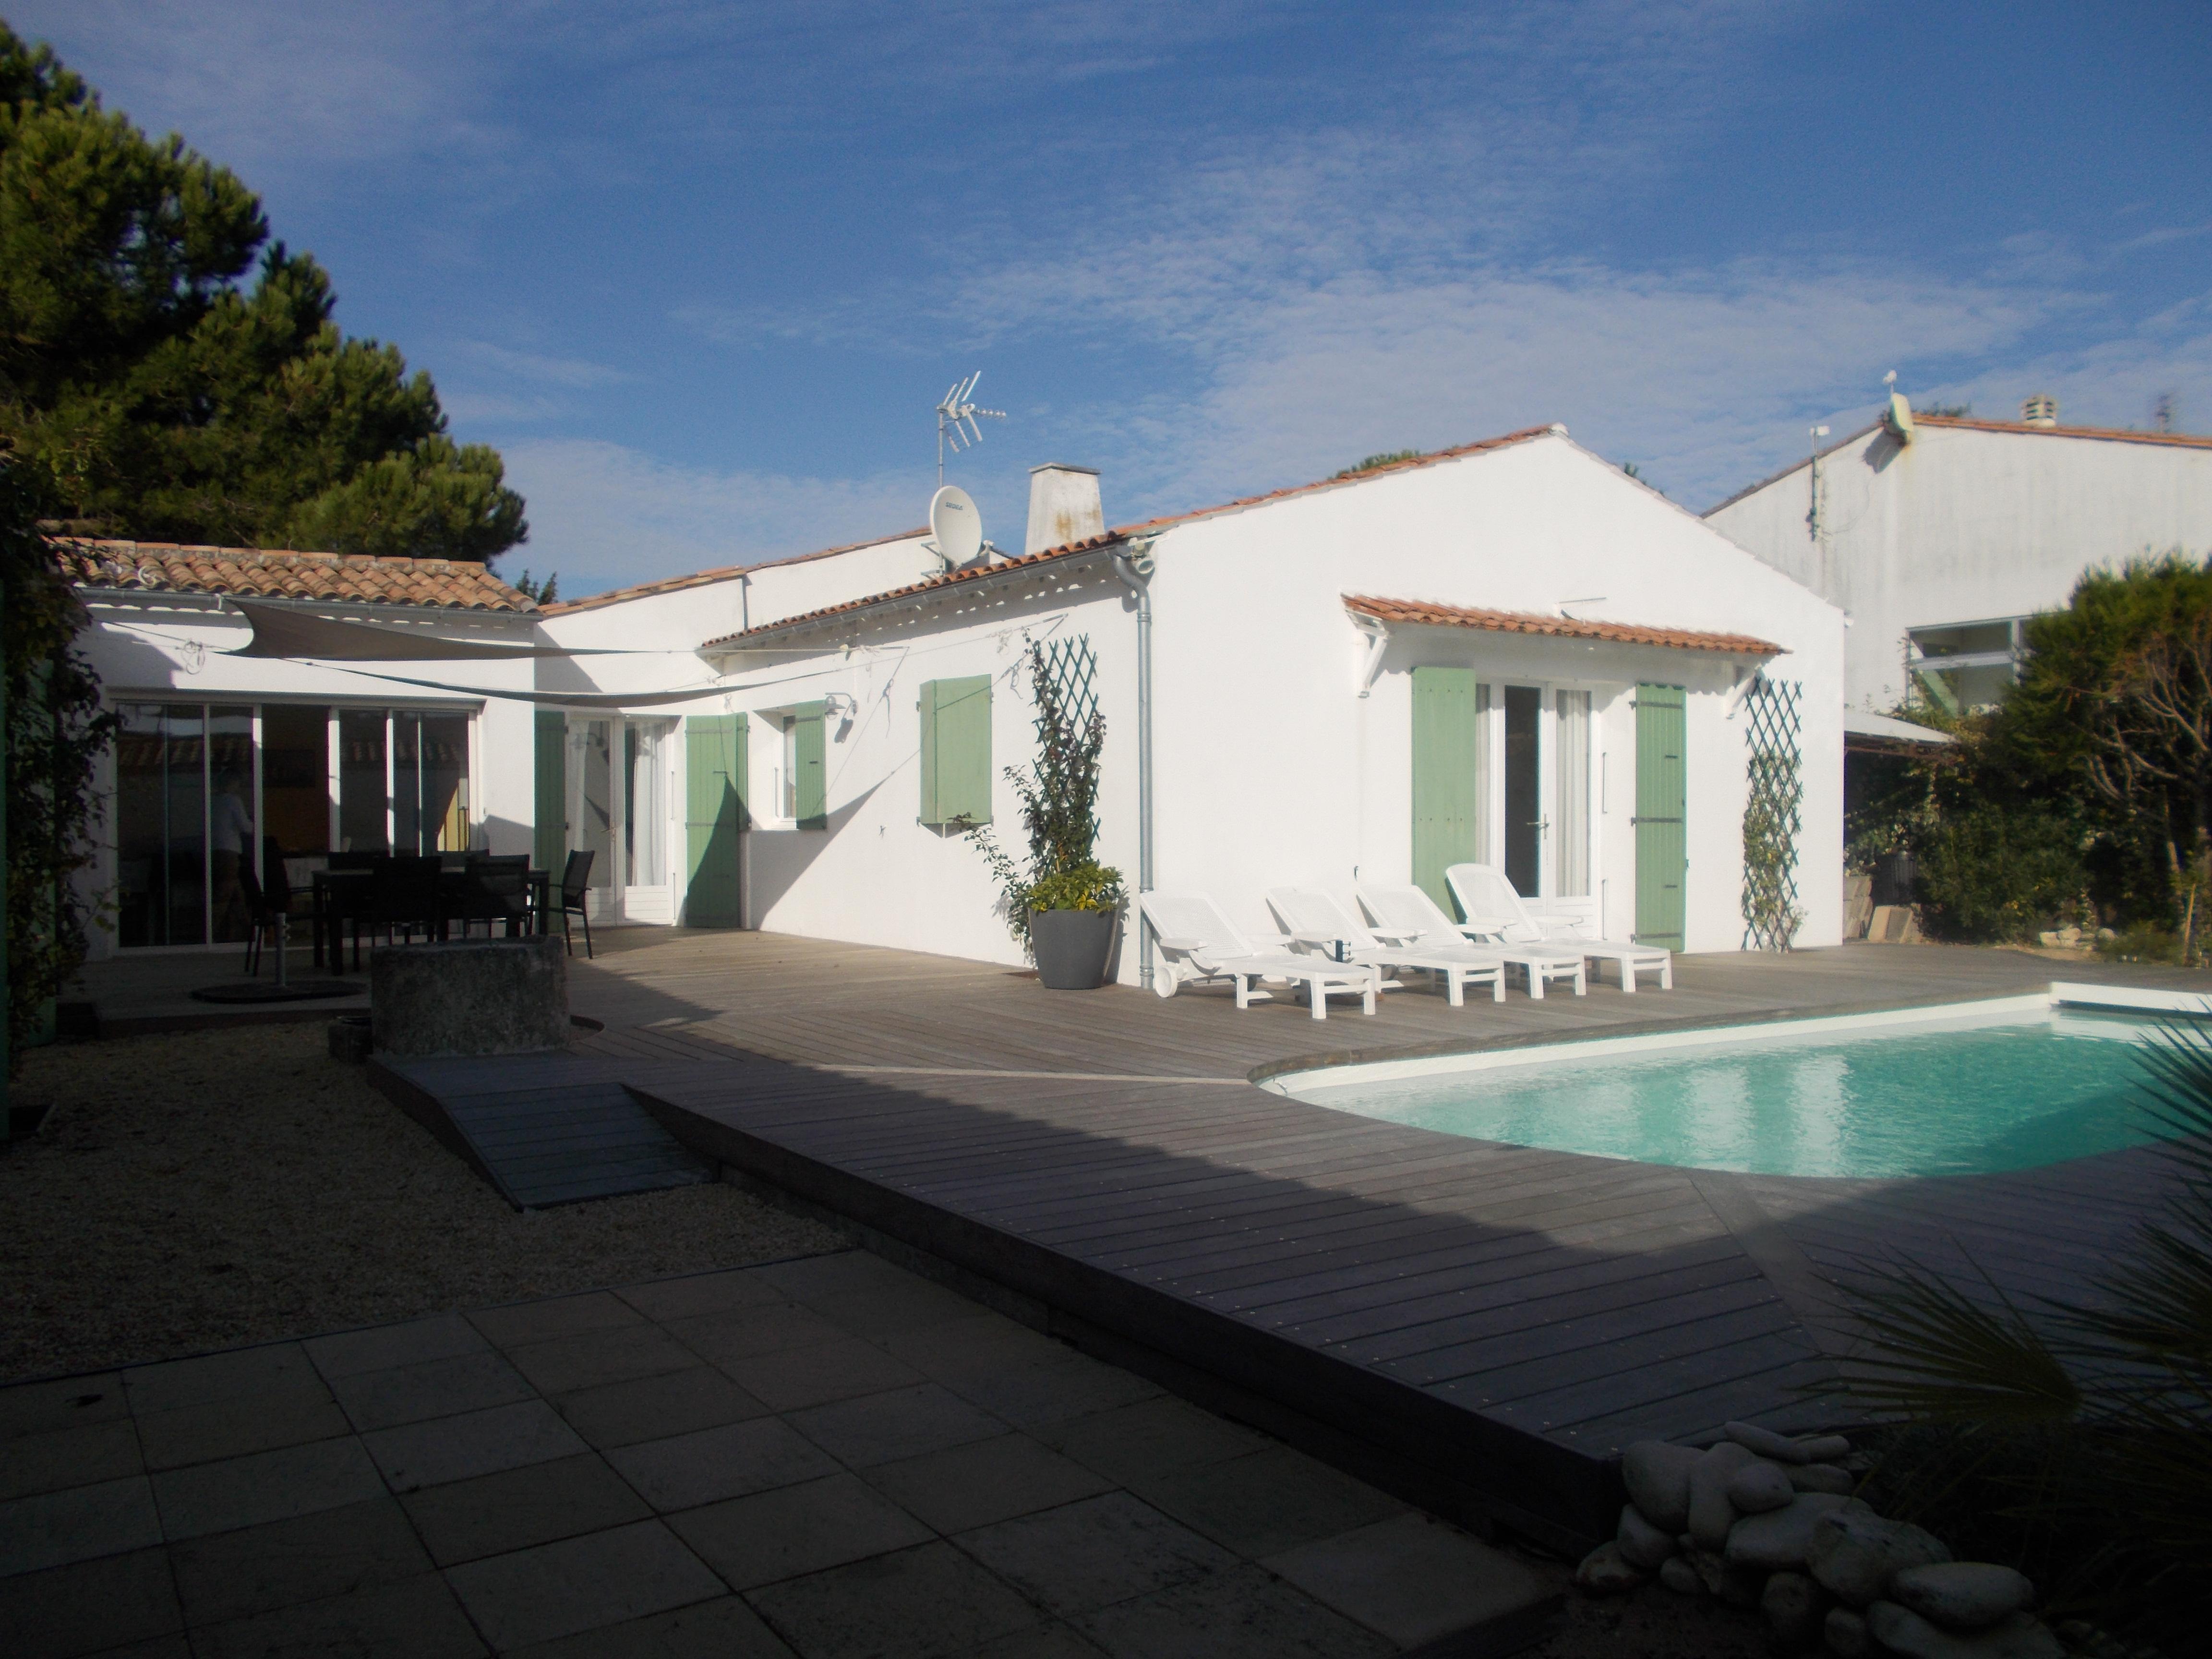 location ile de r rivedoux plage ferienhaus f r 8 10 personen mit swimmnig pool easy r. Black Bedroom Furniture Sets. Home Design Ideas